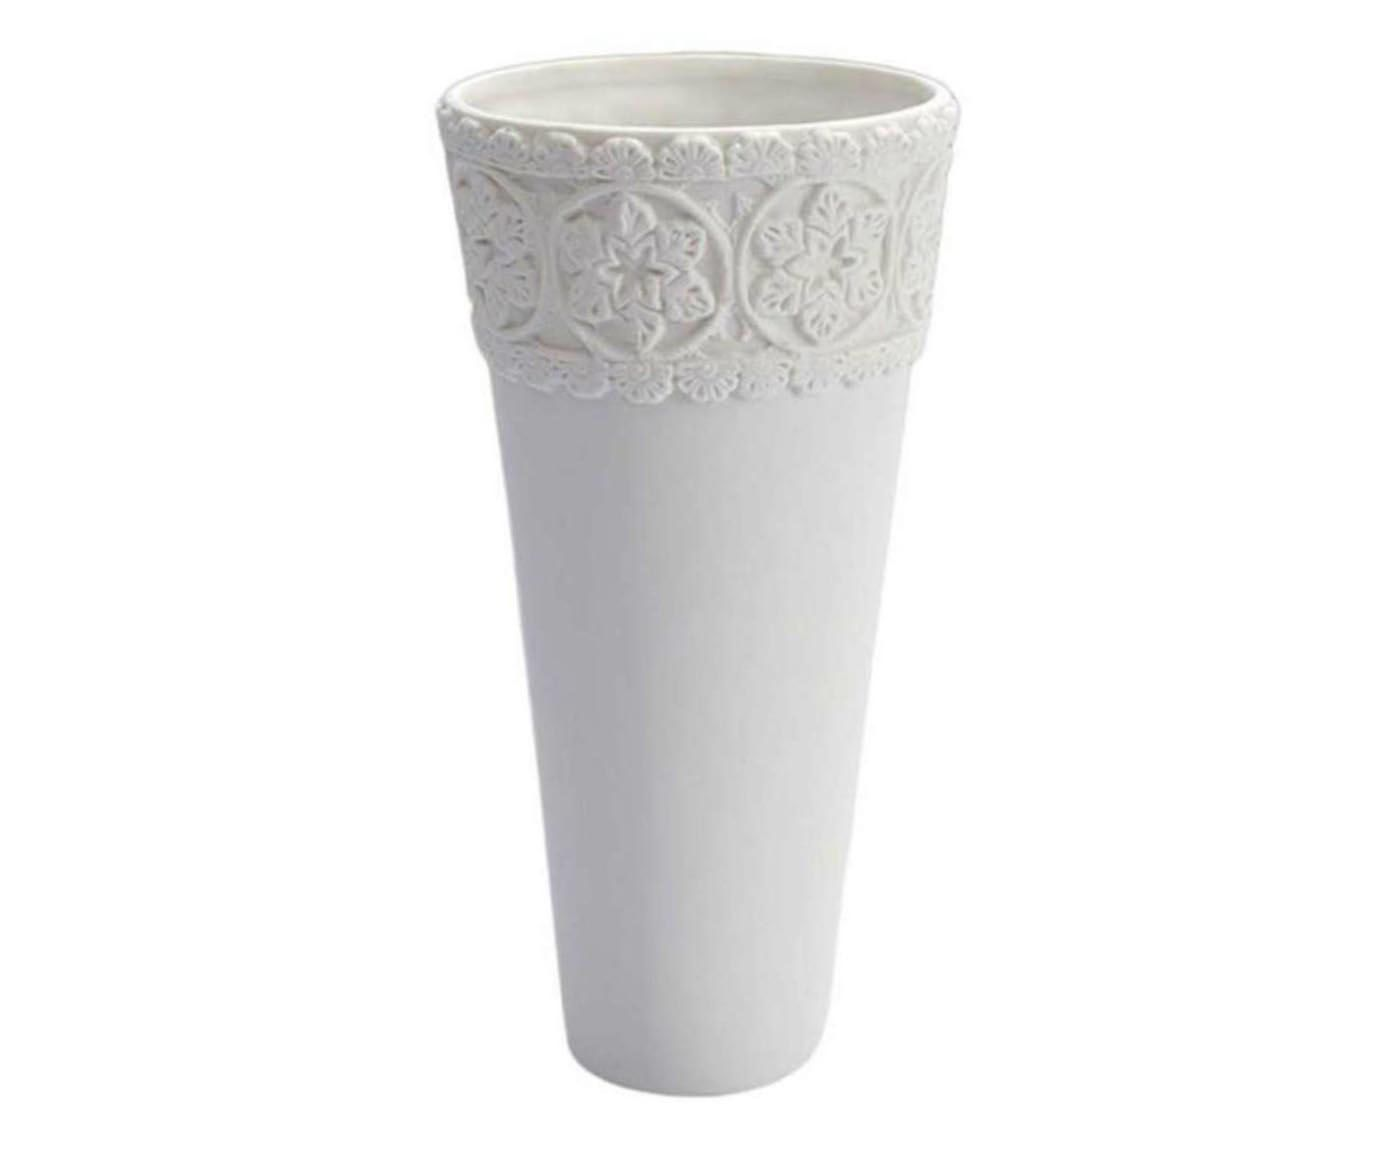 Vaso petrier - 29 x 14 cm | Westwing.com.br